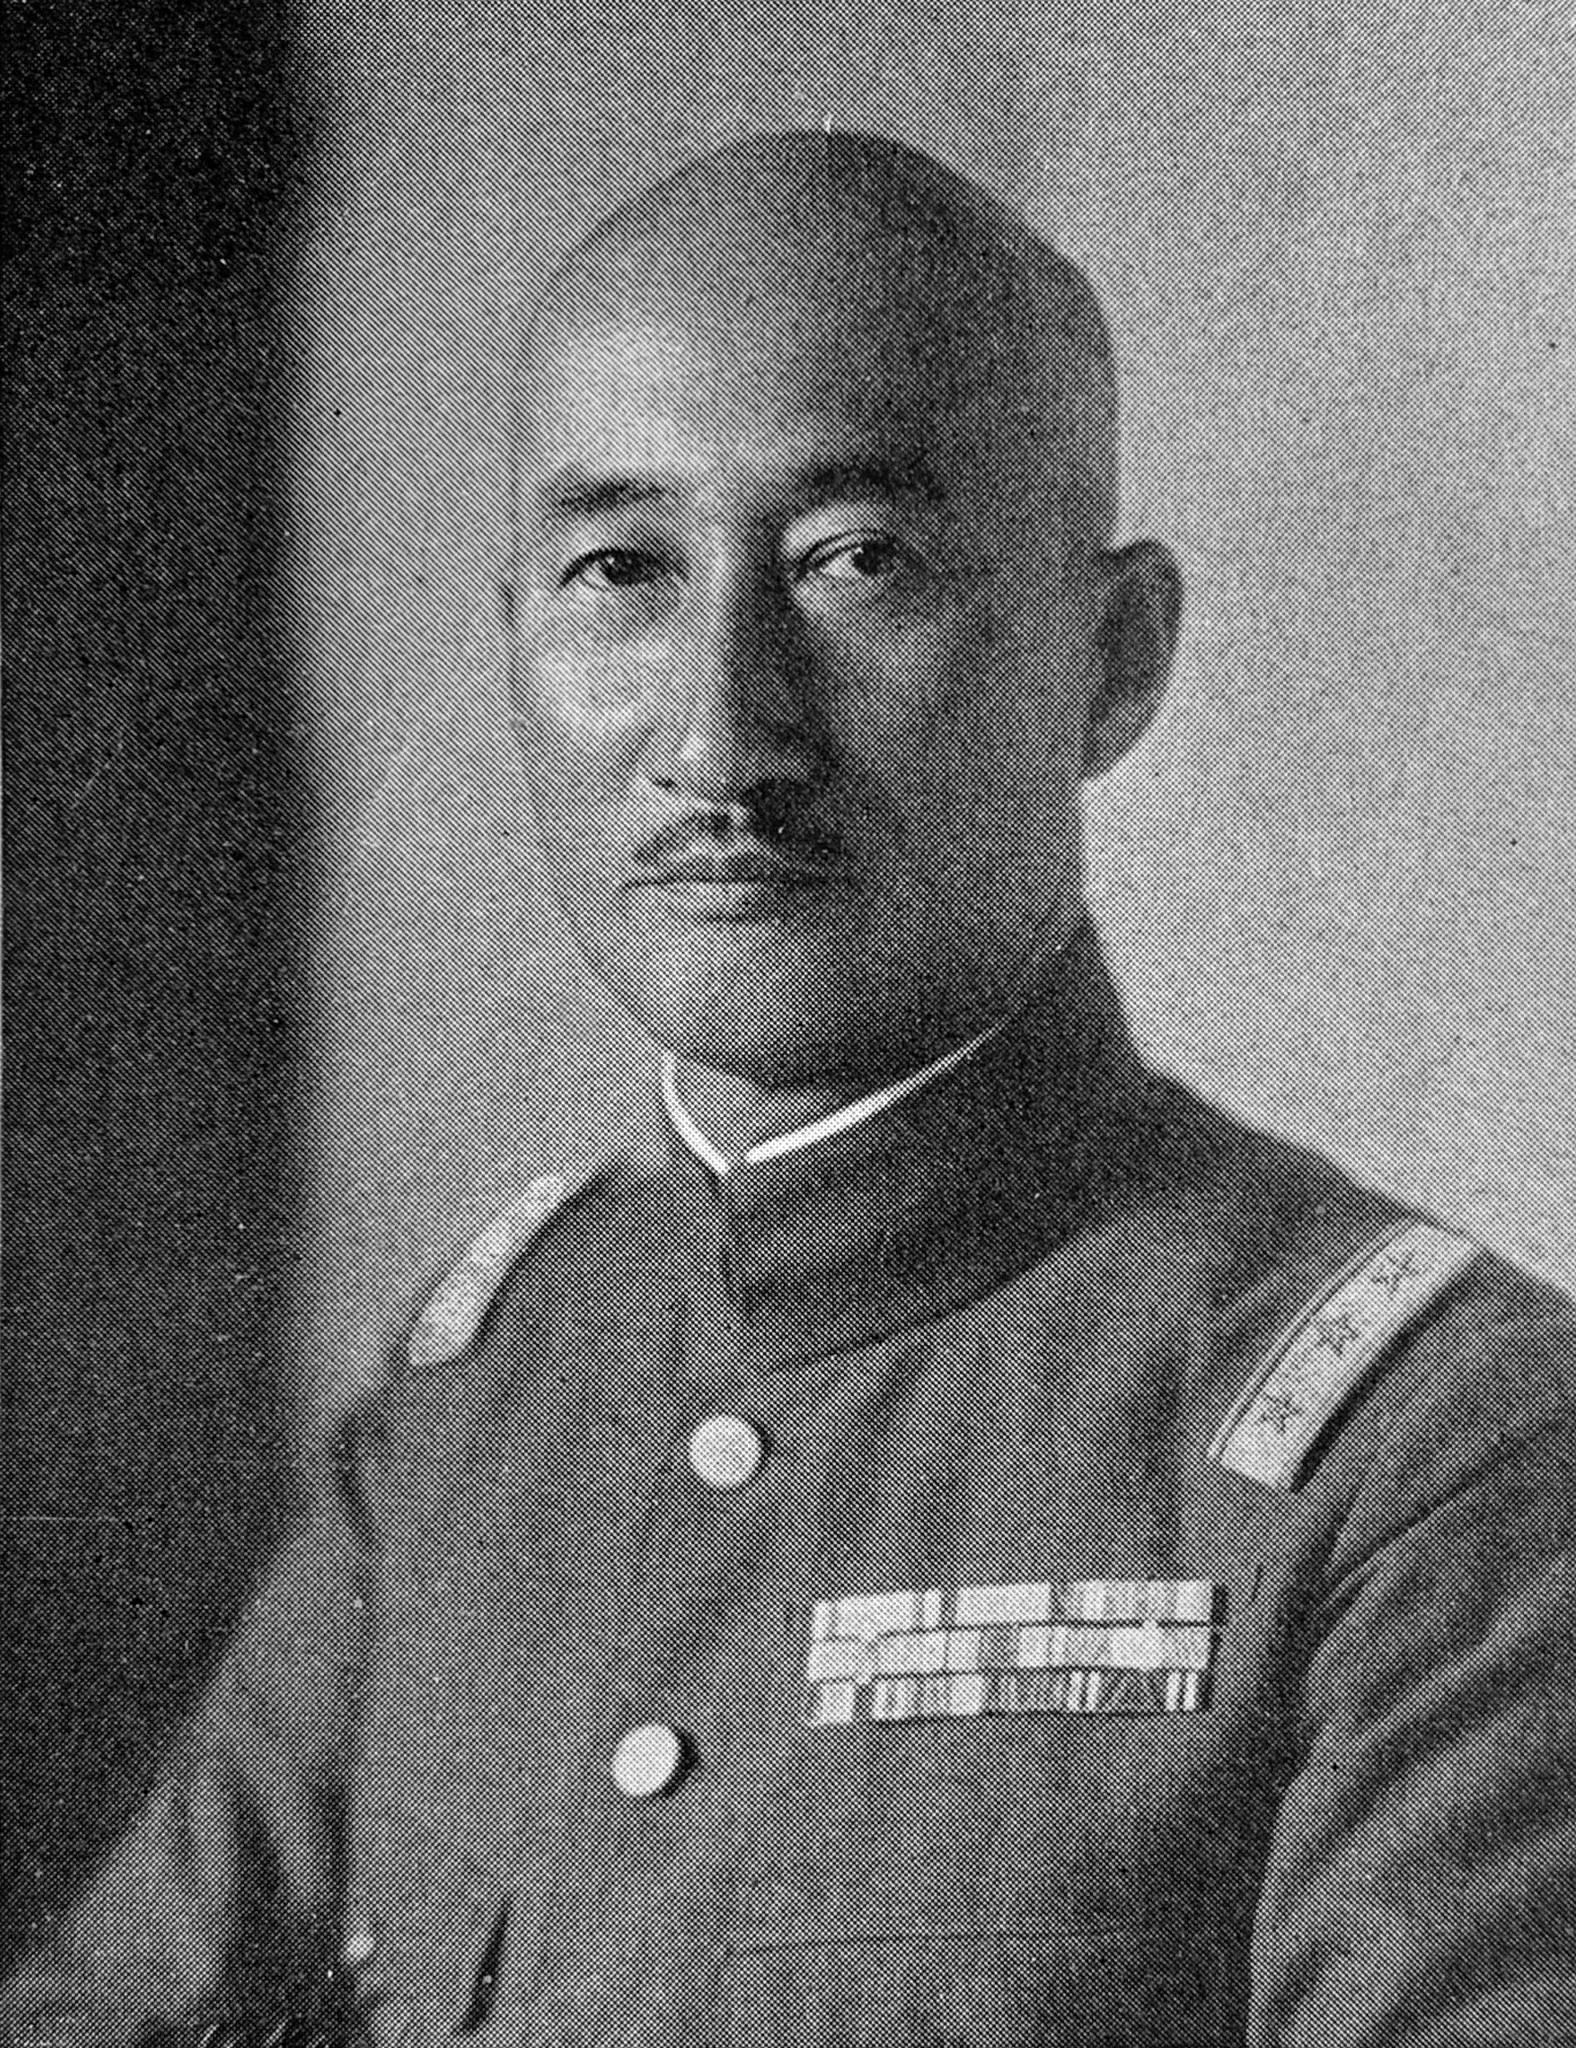 Hisaichi Terauchi Japanese general